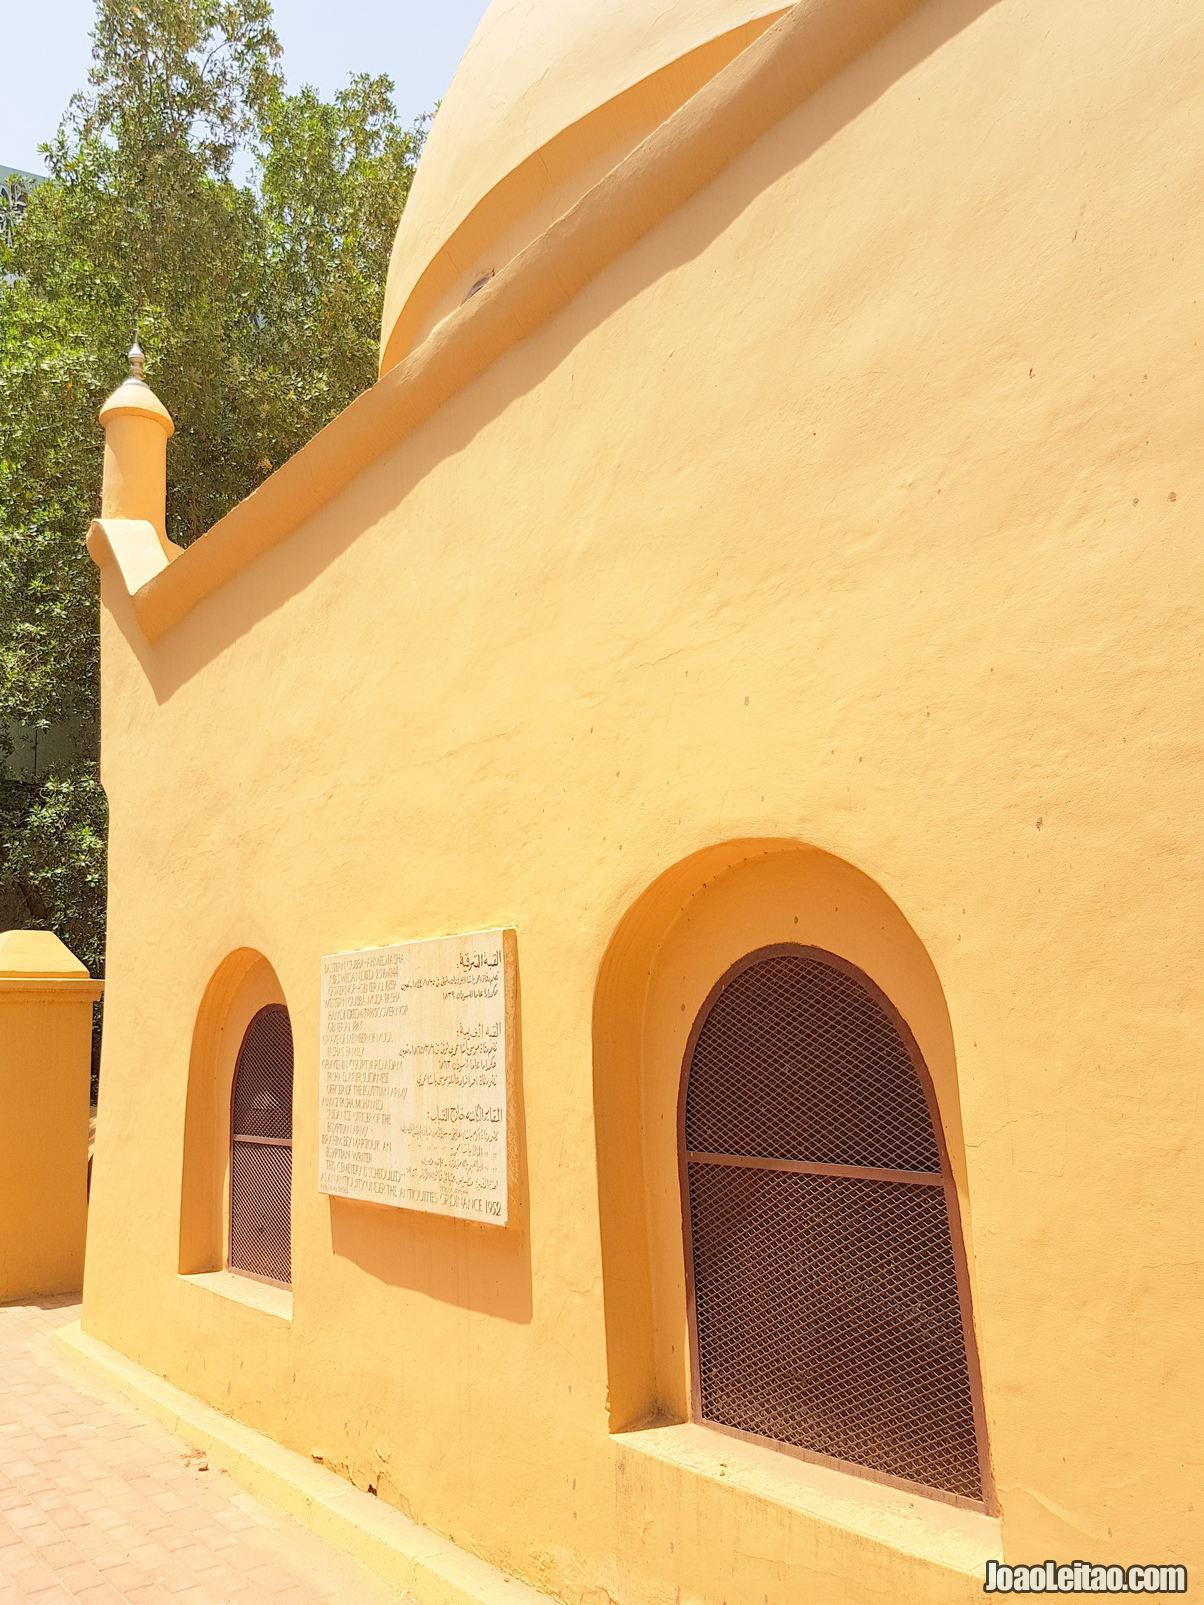 Turkish Graves in Khartoum